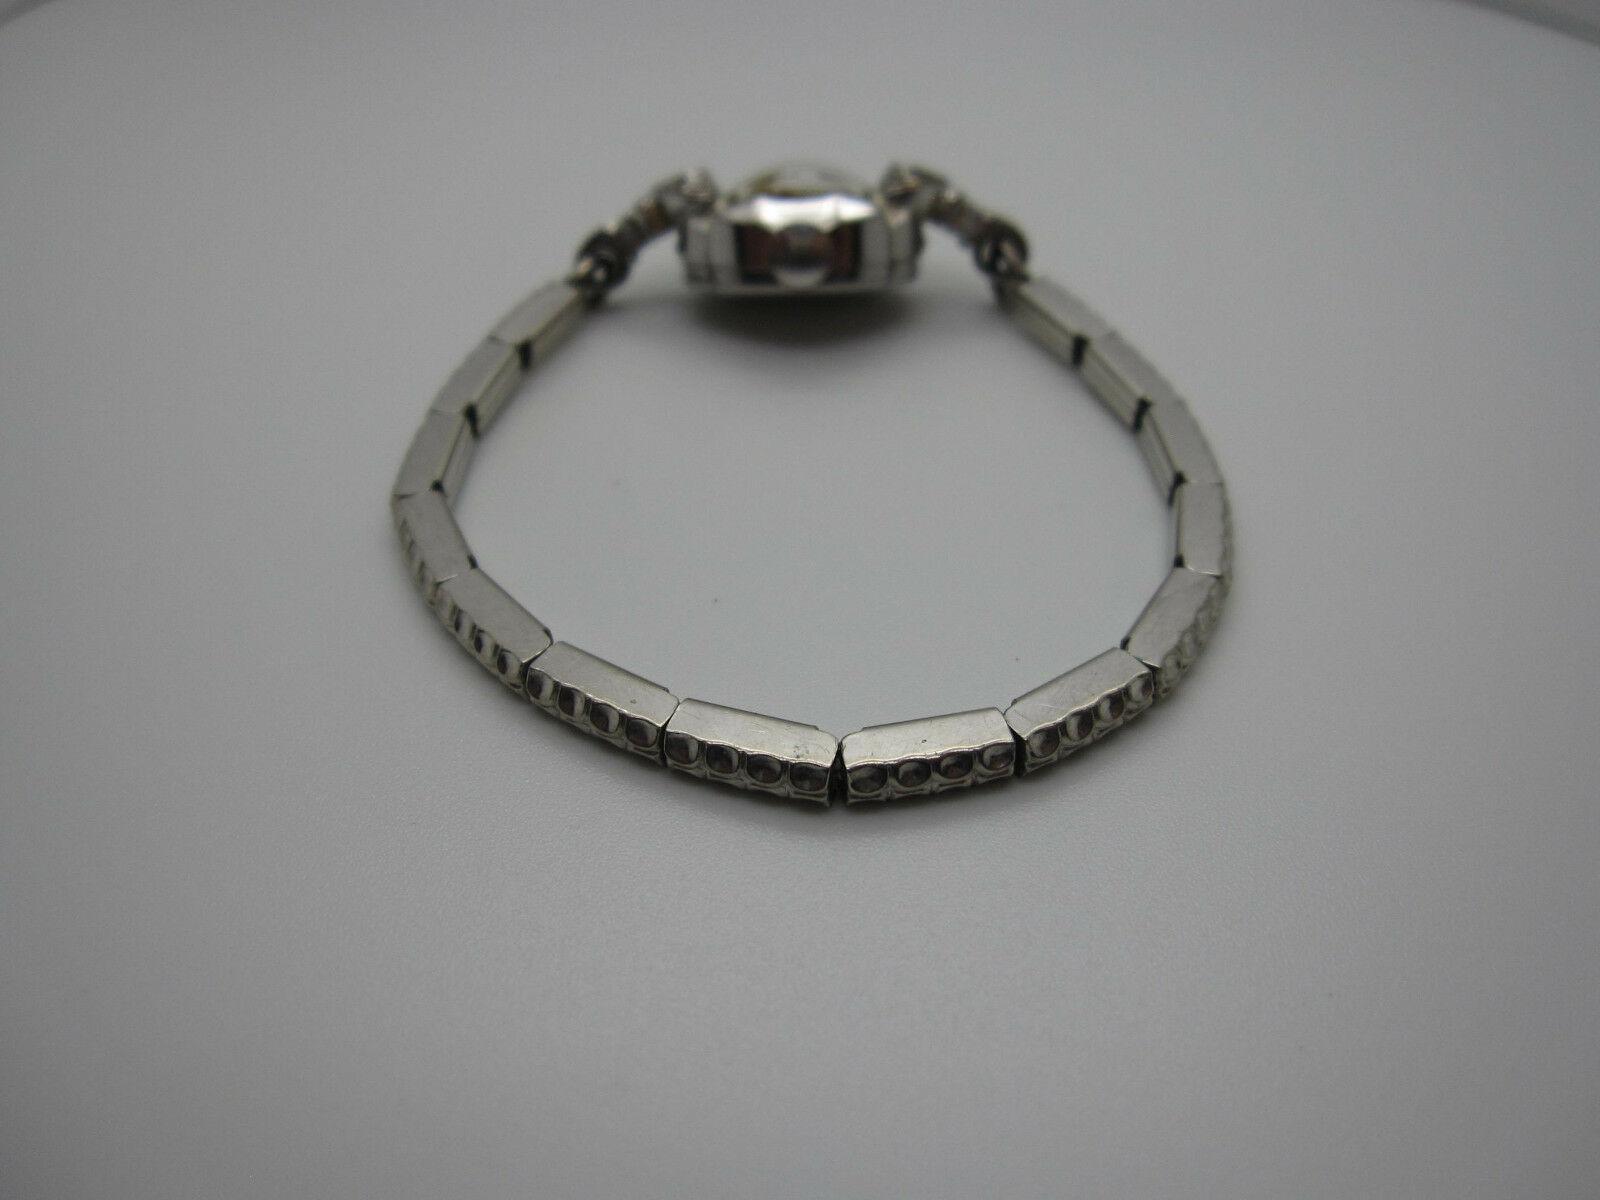 Vintage Women's Hallmark 25 Jewels 10k Rolled Gold Plated Hand Wind Watch image 9